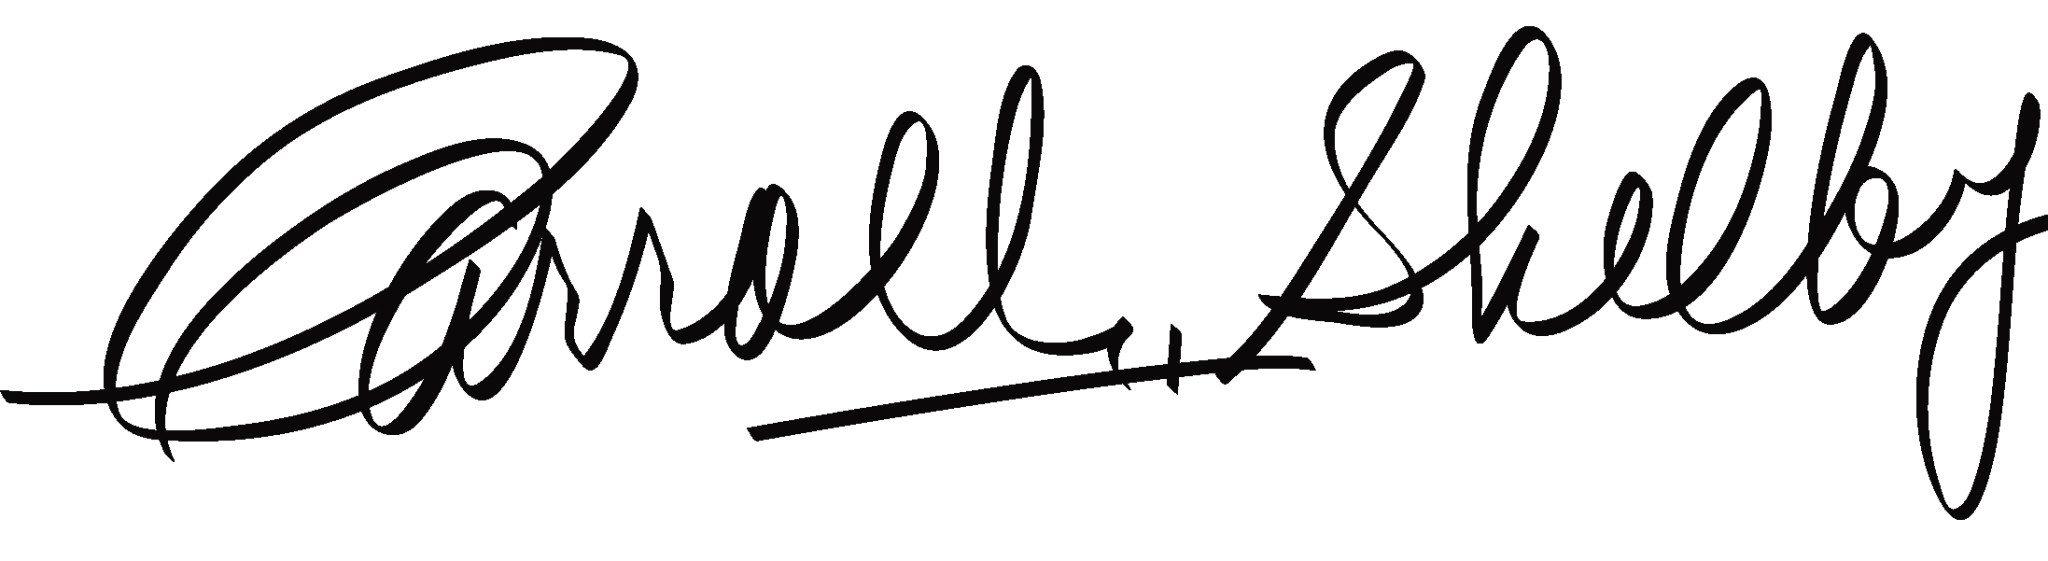 Carroll Shelby Signature